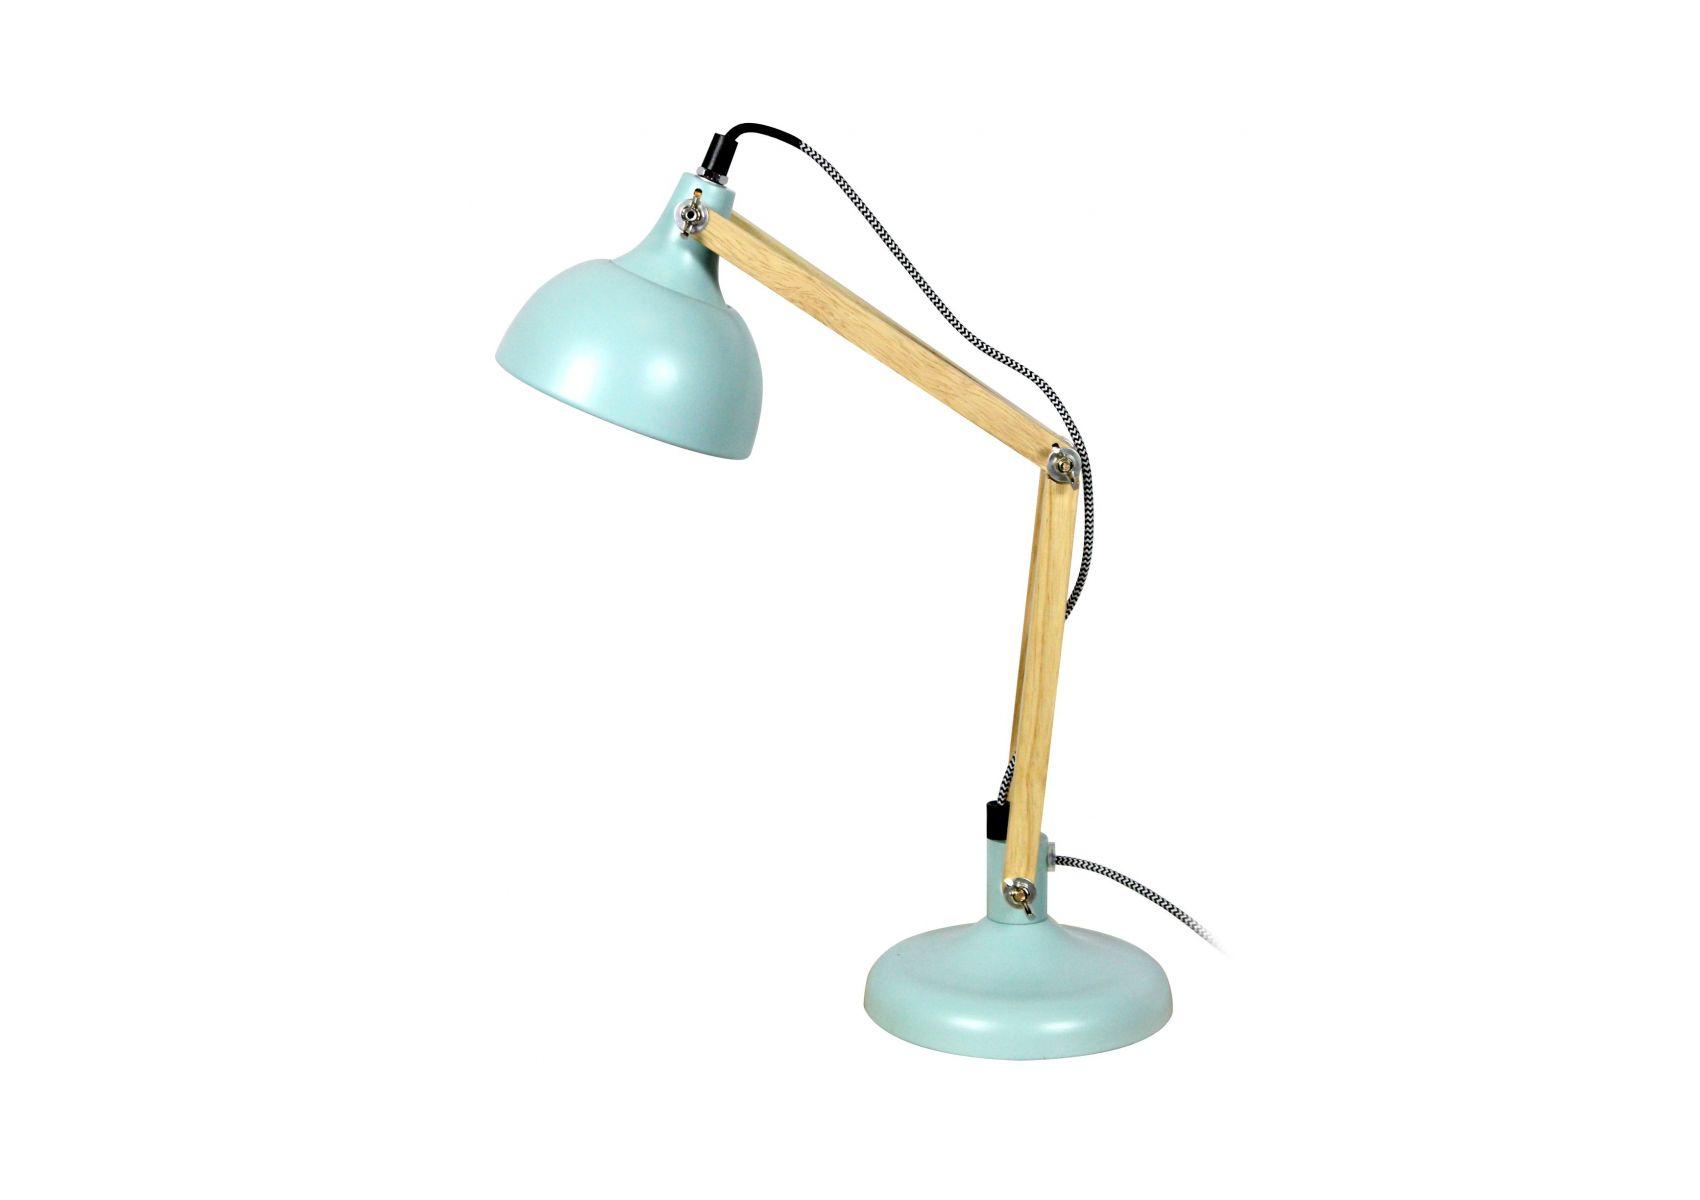 lampe de bureau en bois articul dexter mini redcartel. Black Bedroom Furniture Sets. Home Design Ideas